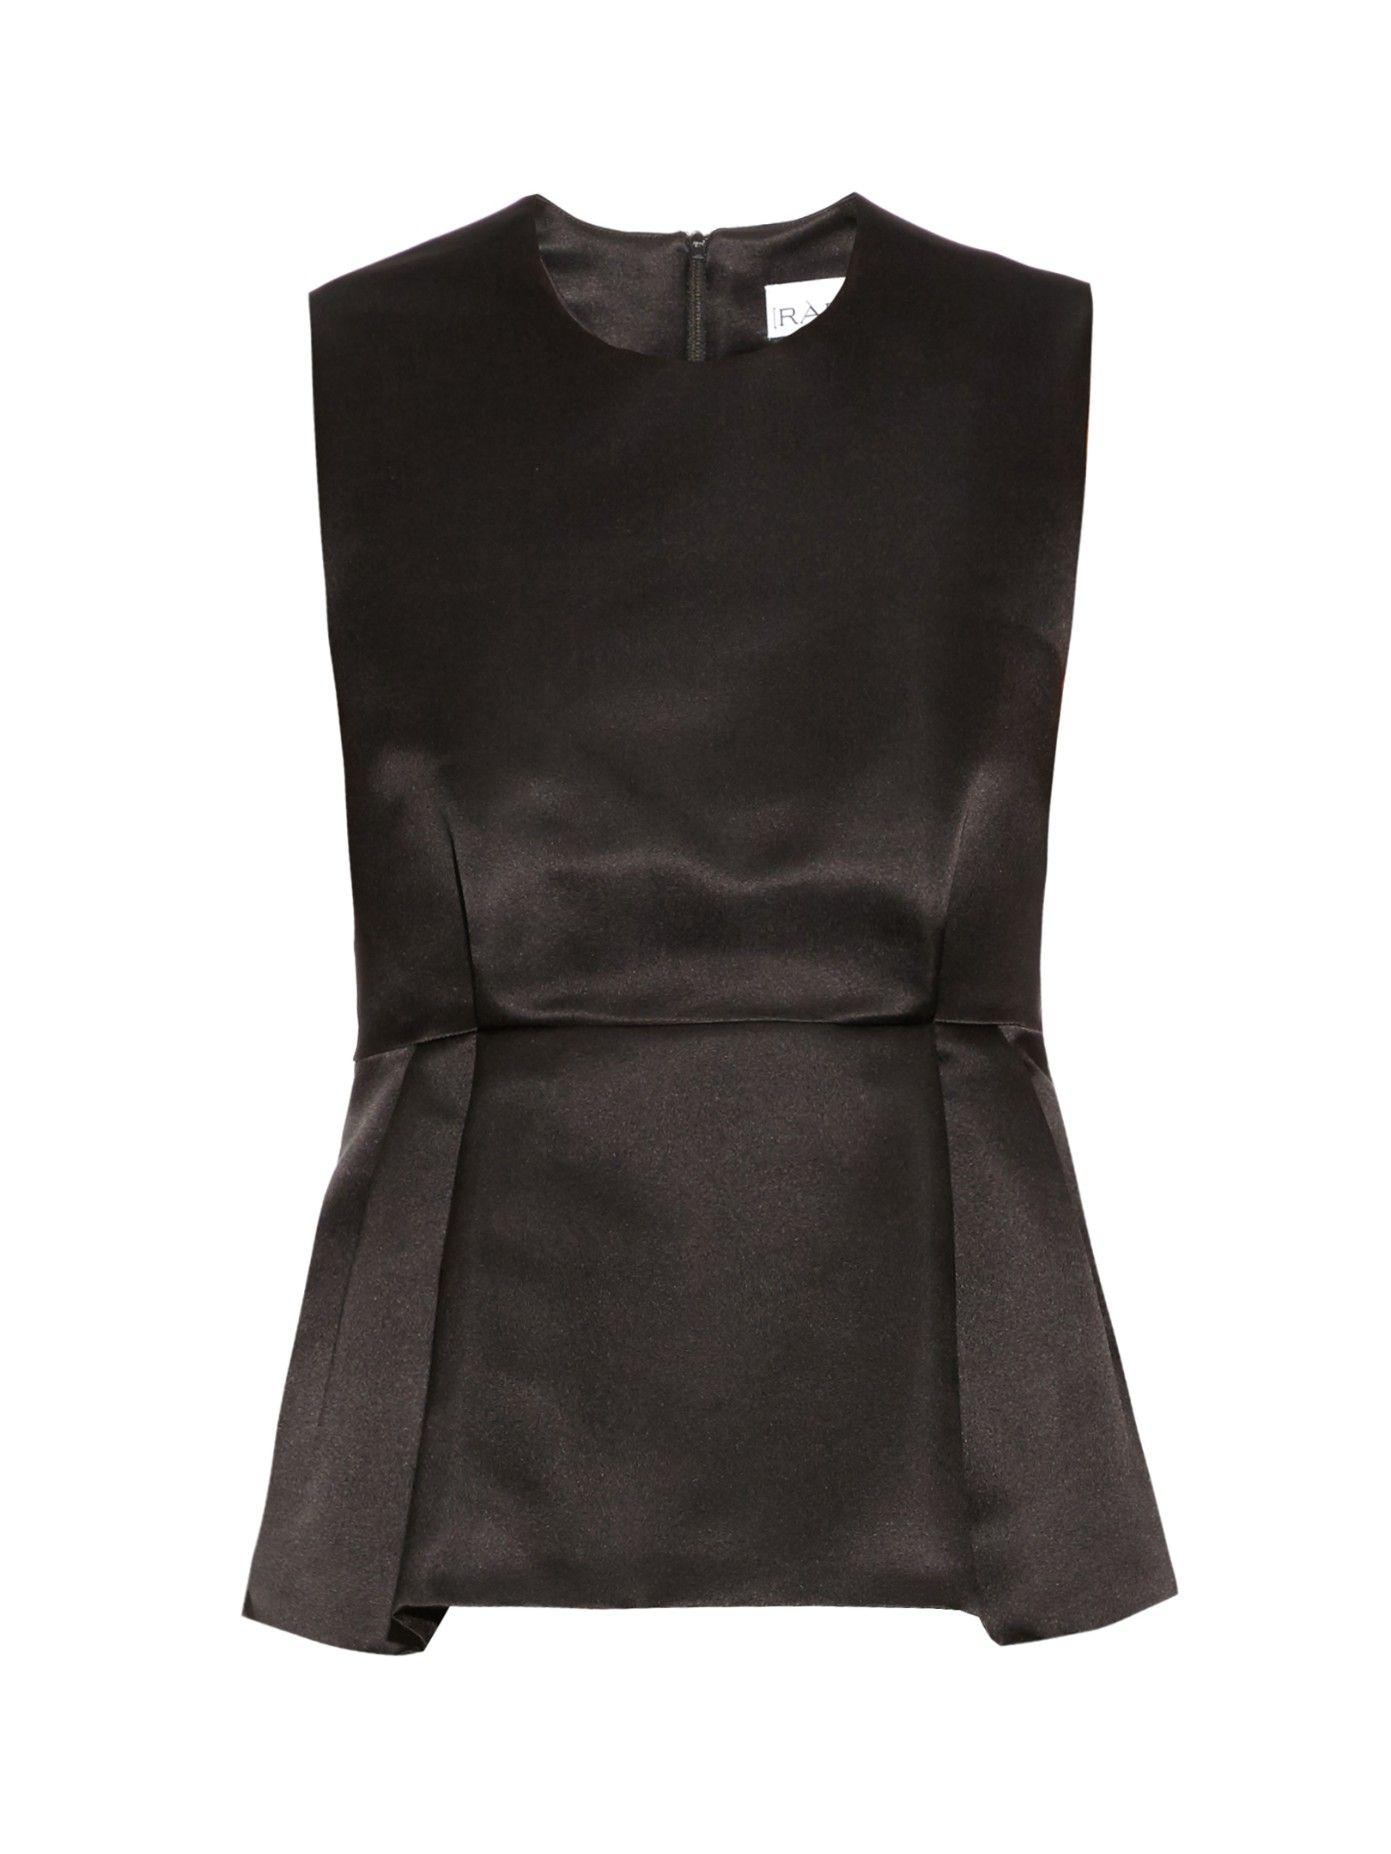 Badydoll duchess silk-satin top by Raey | Shop now at #MATCHESFASHION